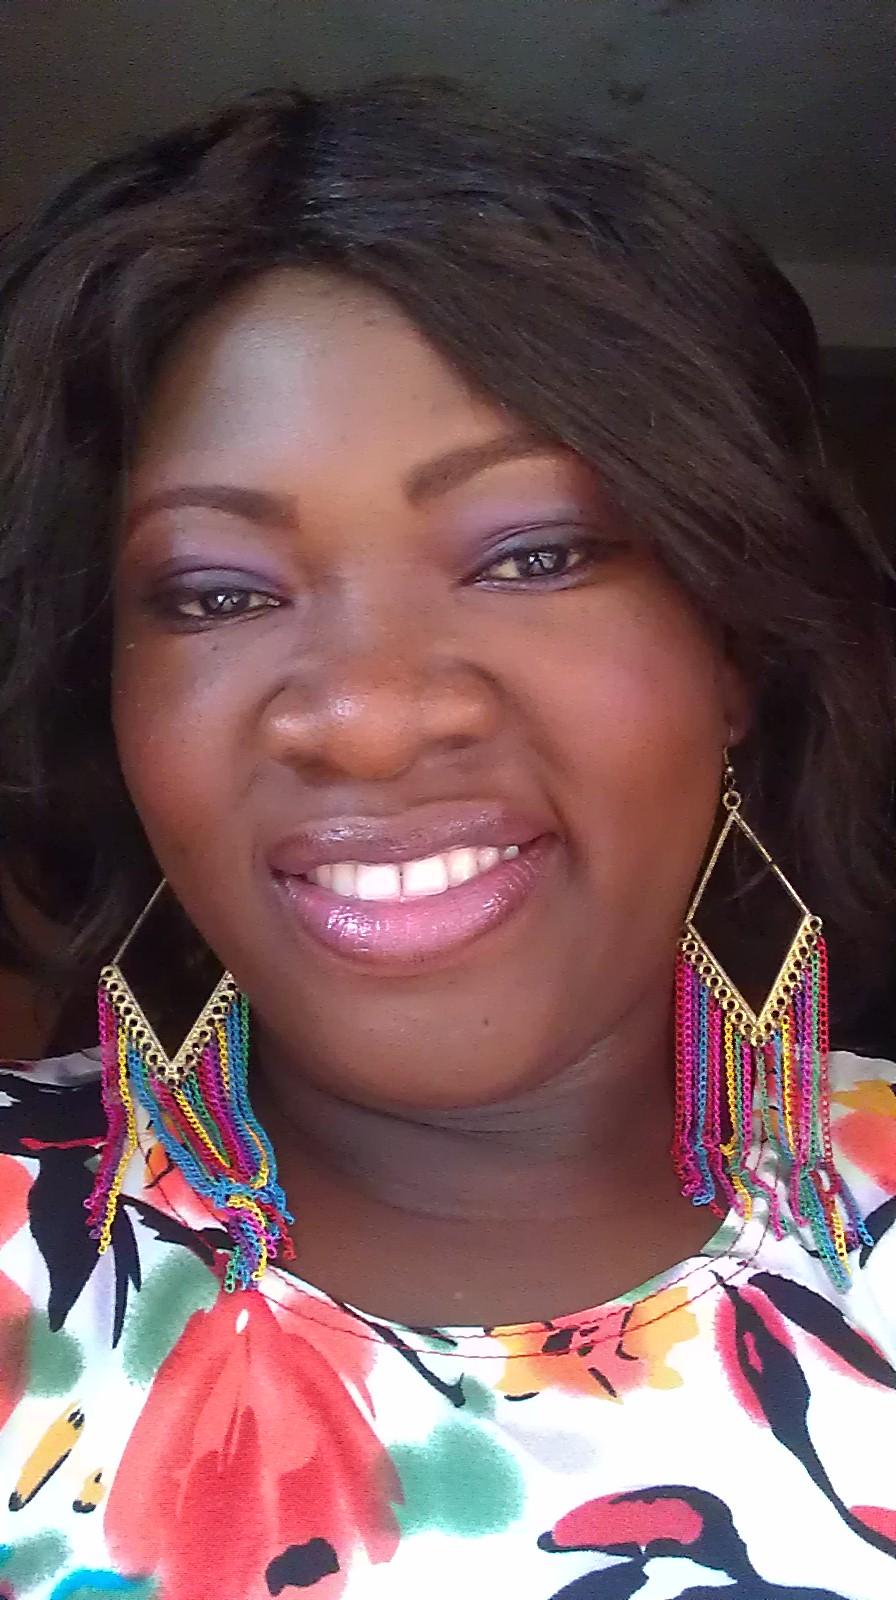 Mavis Adu-Gyamfi avatar picture